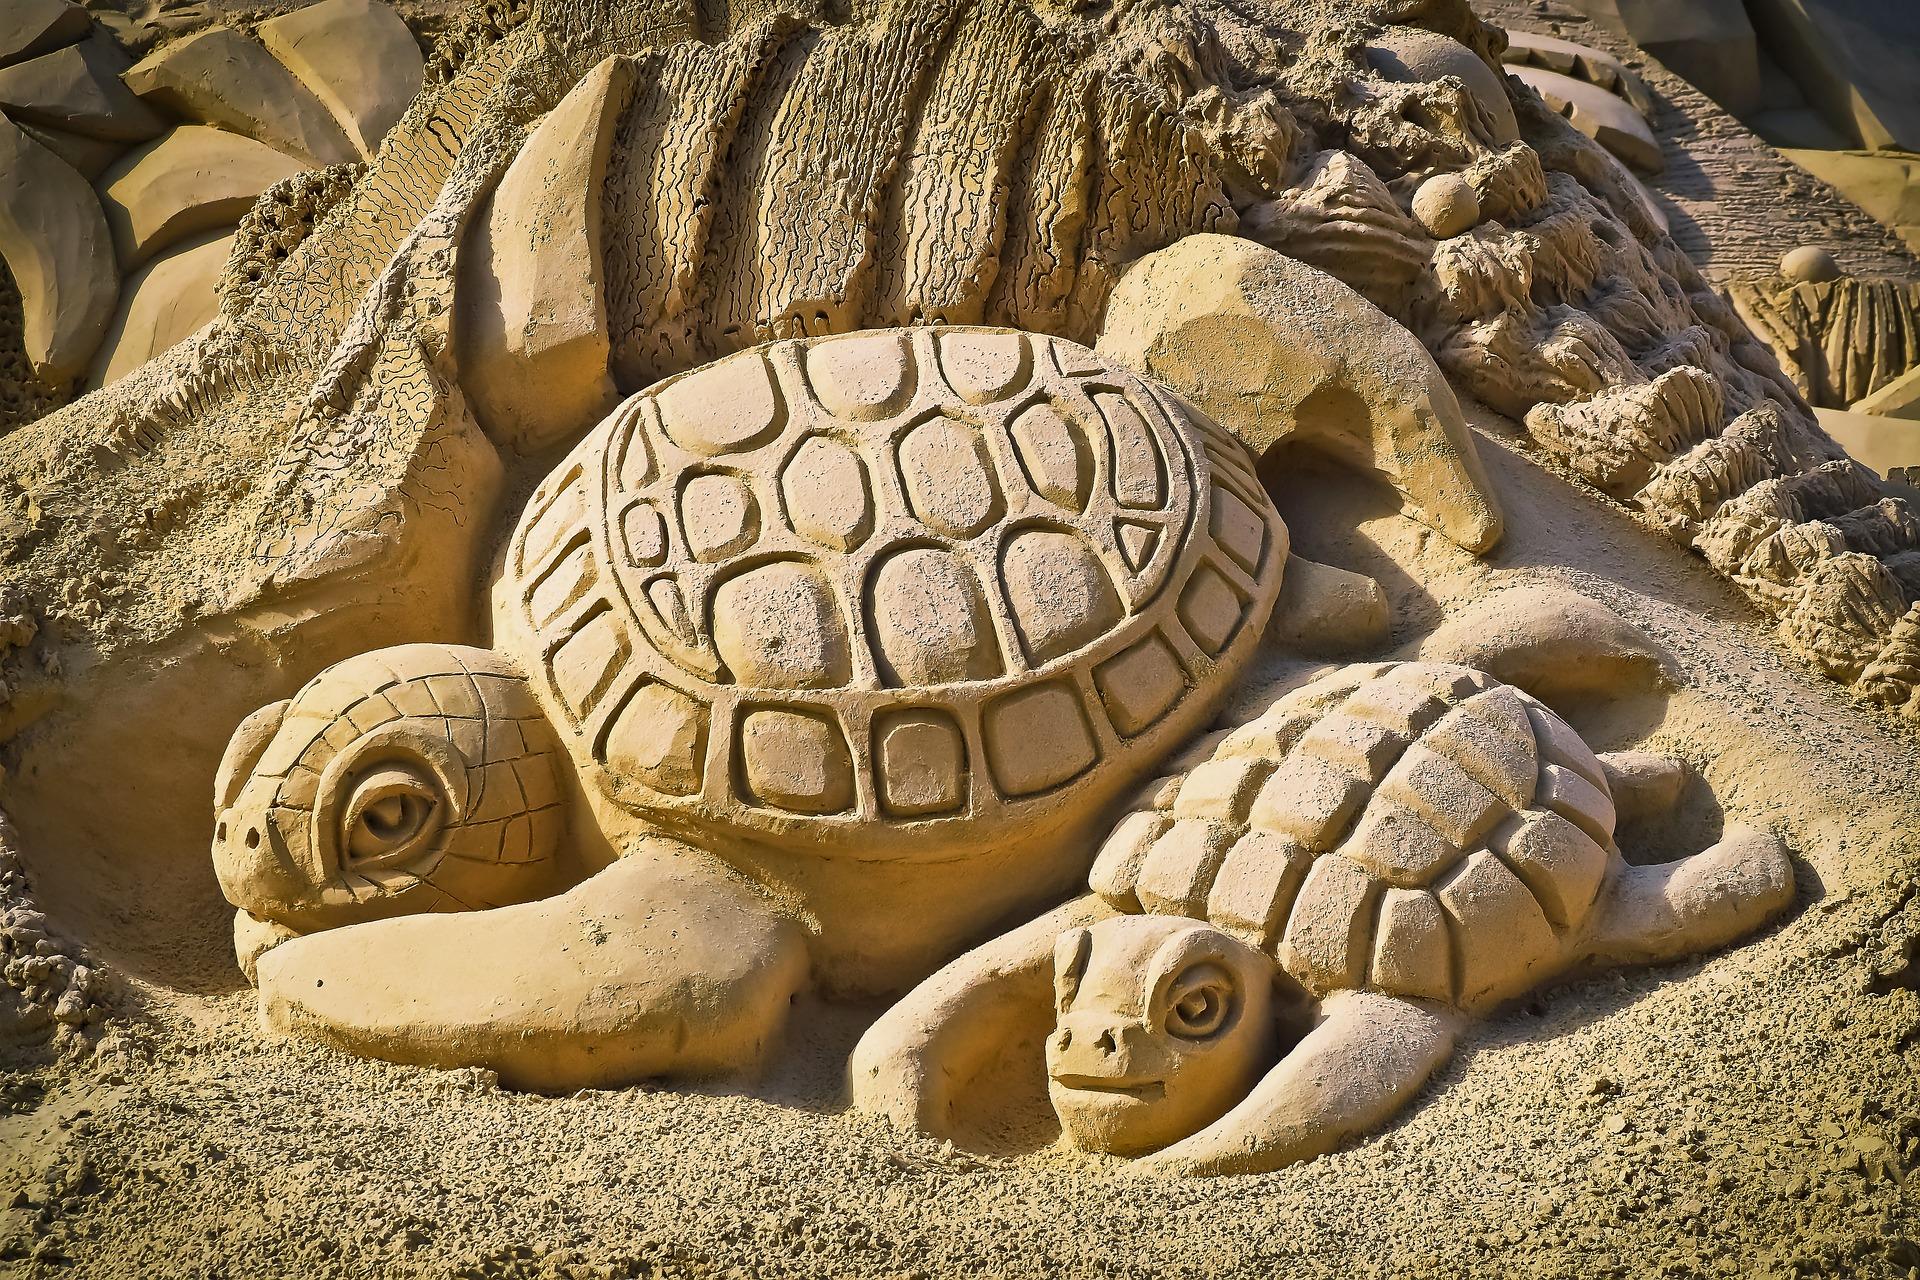 Sandy Turtle, Art, Beach, Figure, Sand, HQ Photo